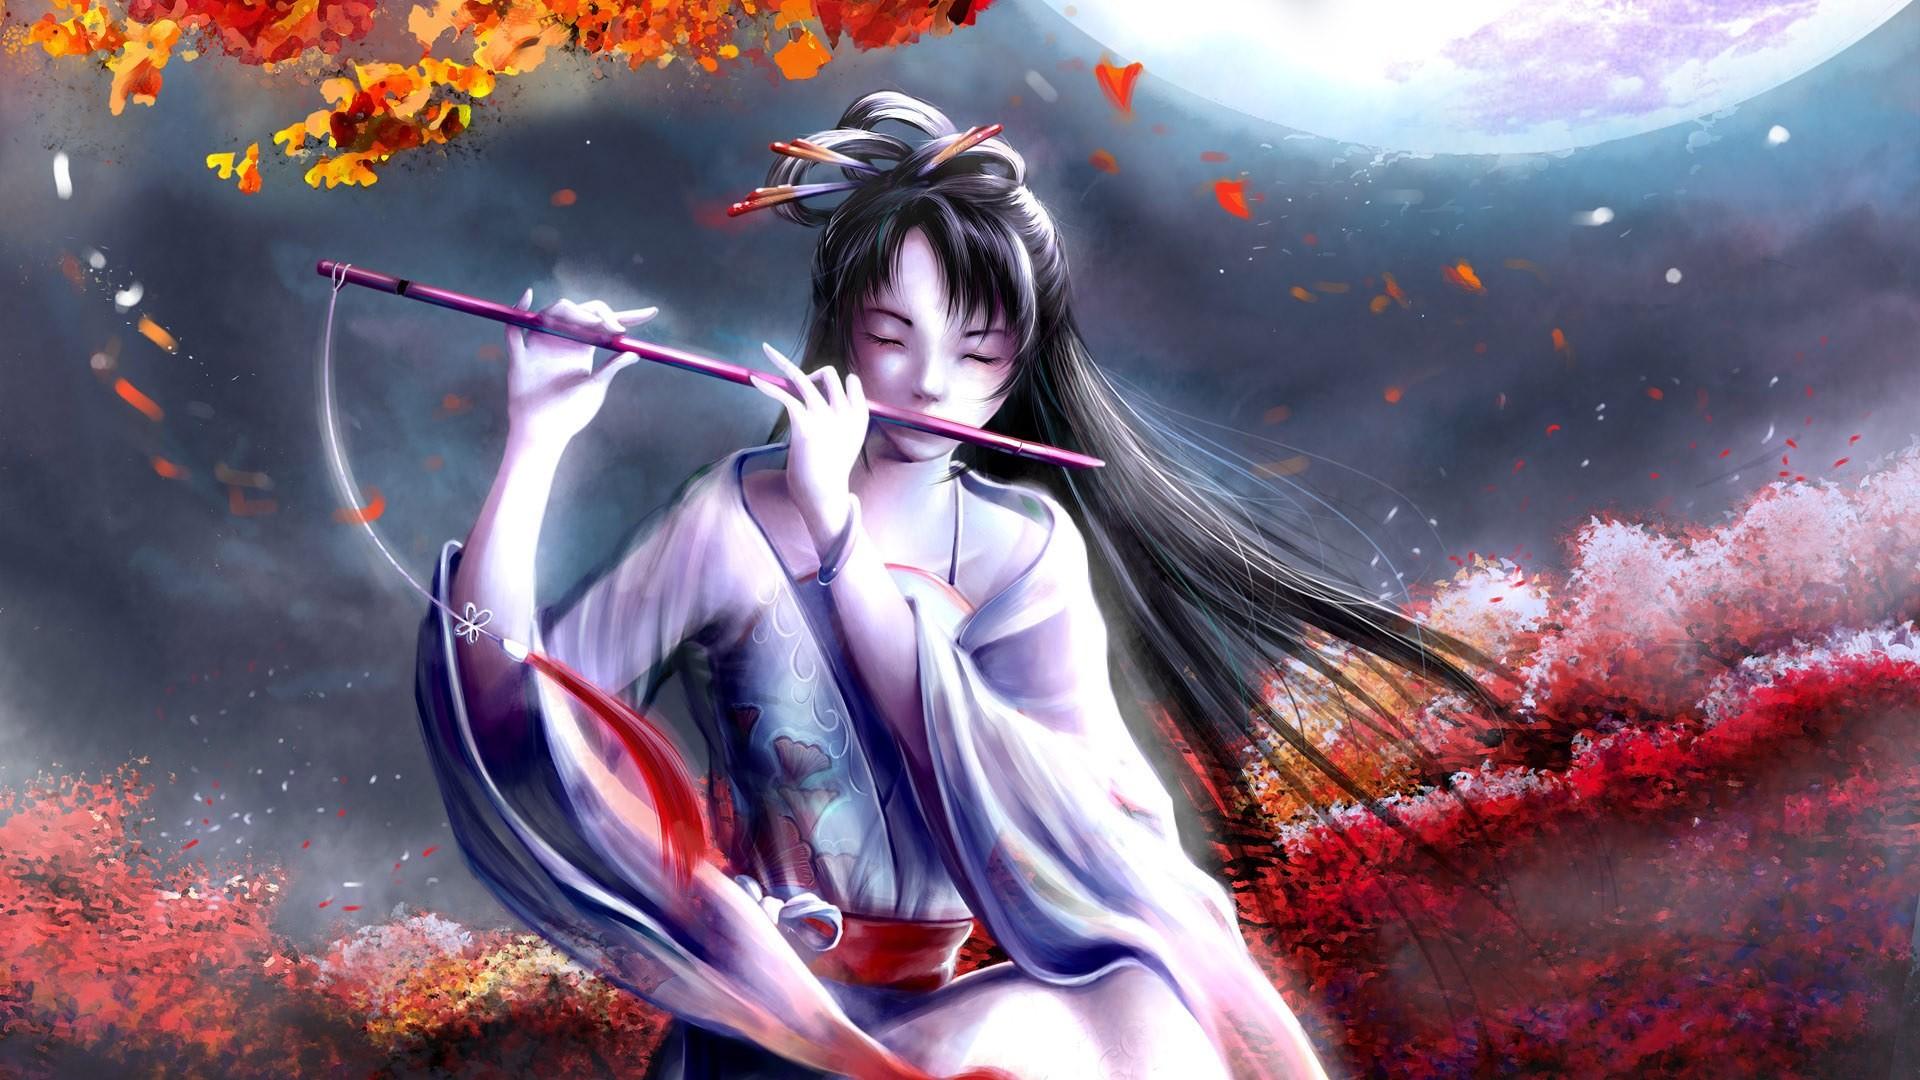 Wallpaper Seni Digital Anime Jepang Seruling Screenshot